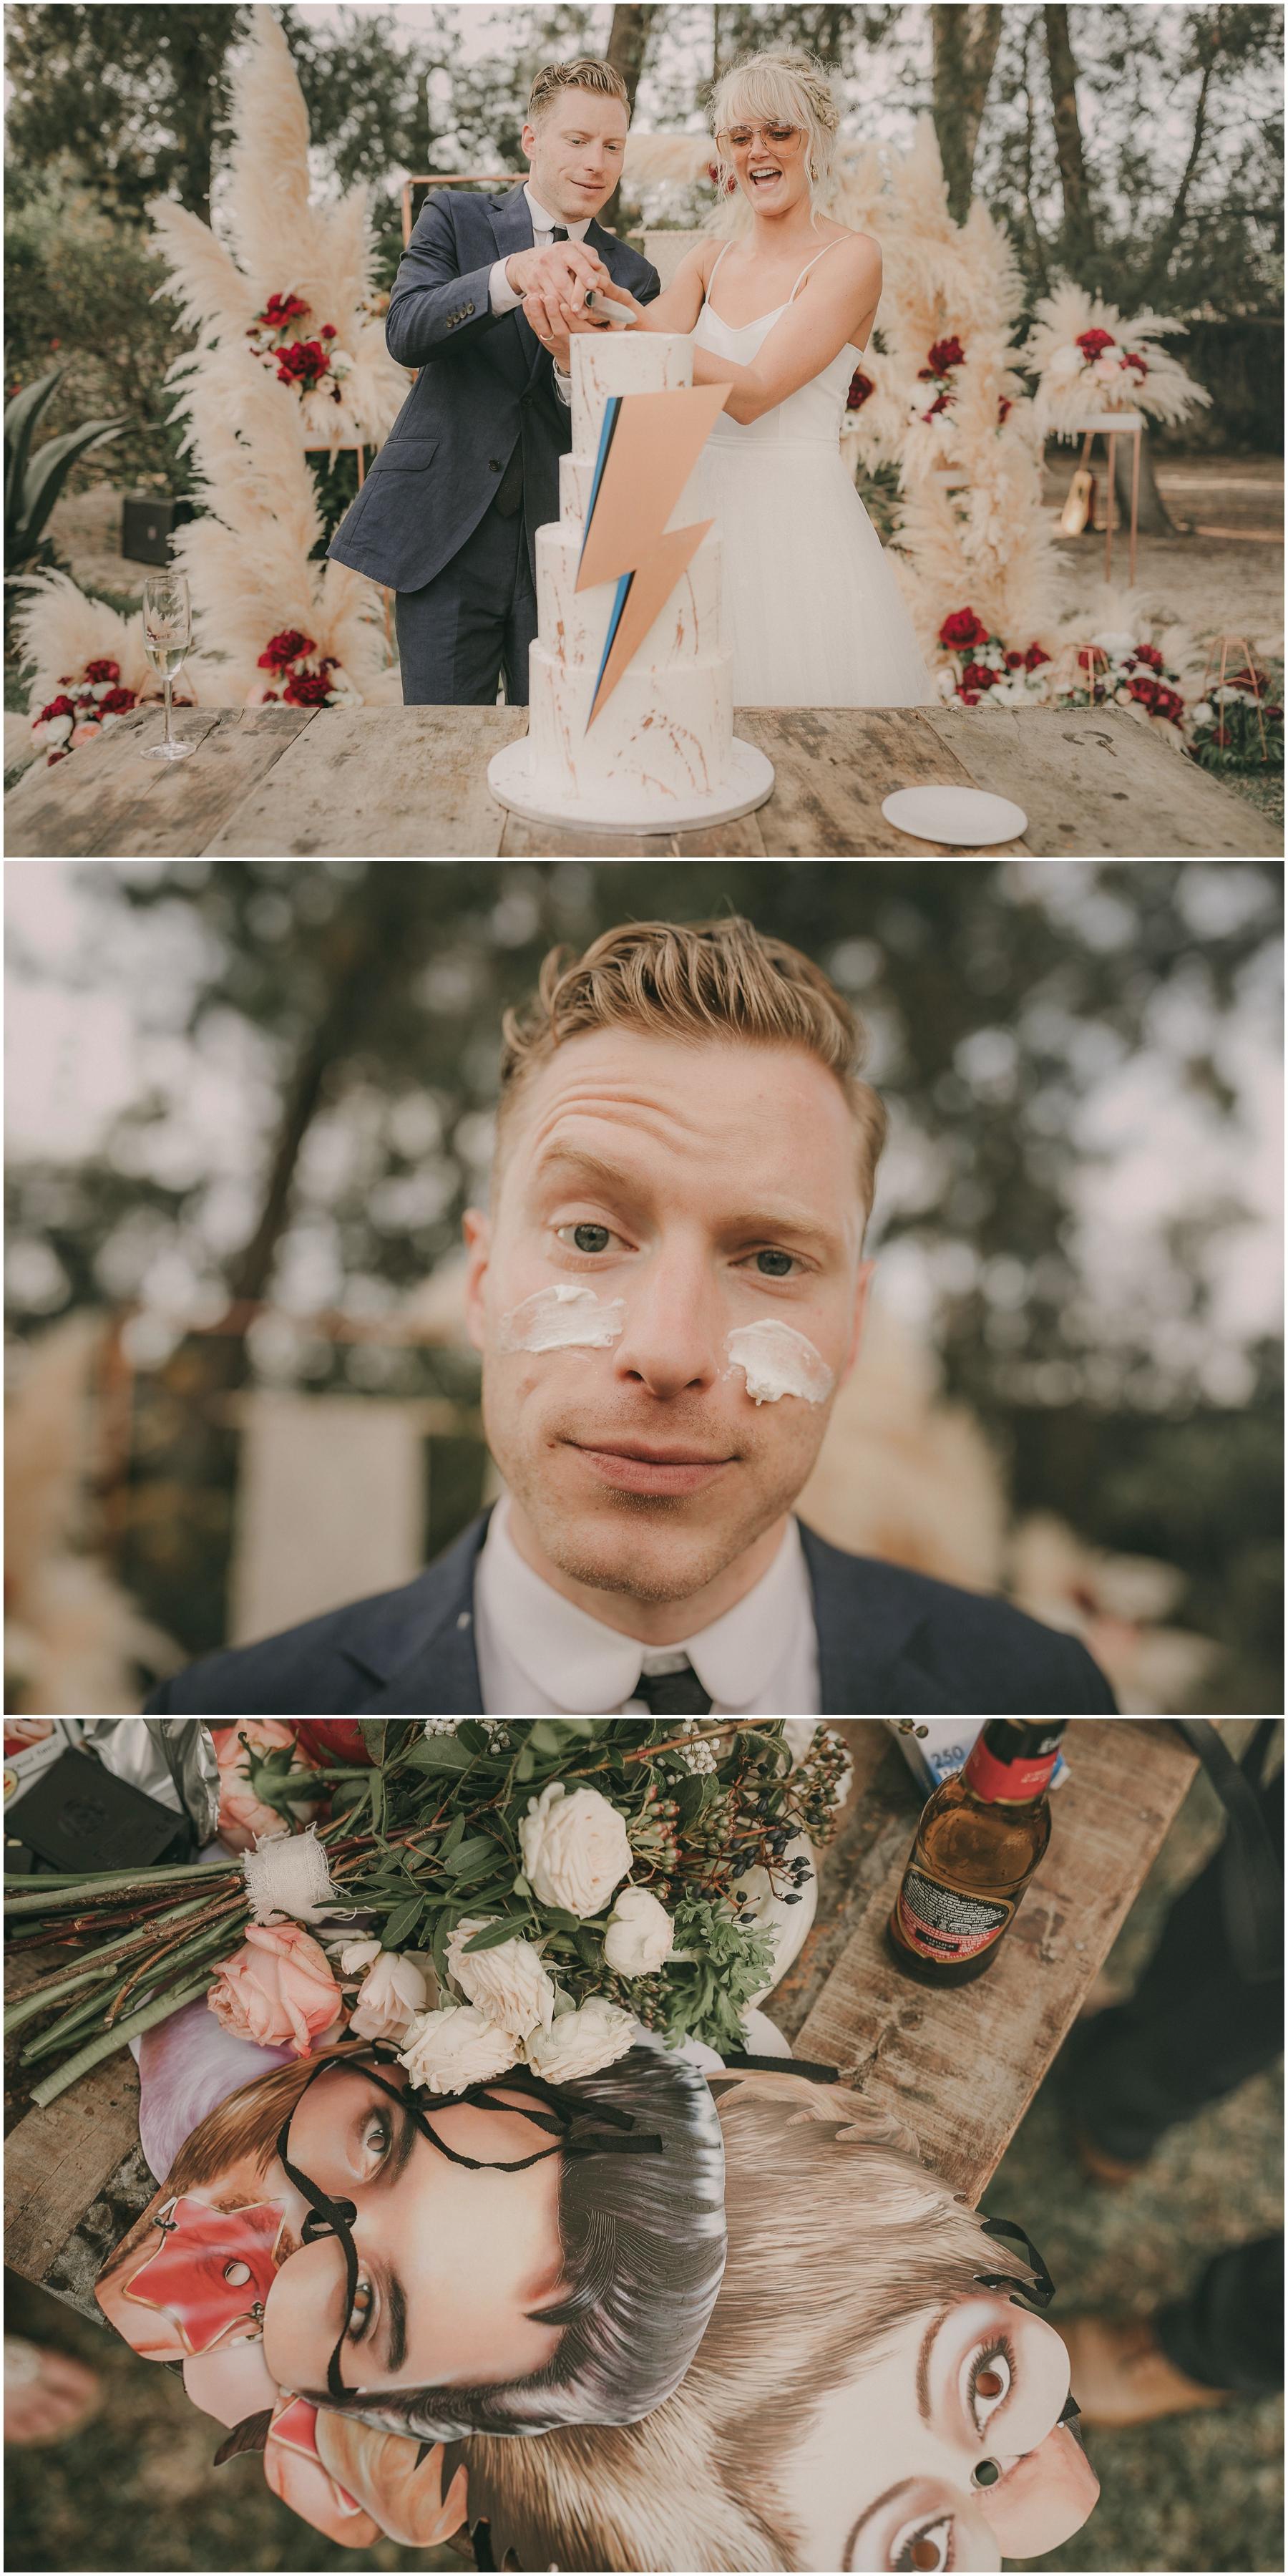 Emily & Joseph London wedding  by Pablo Laguia 218.JPG